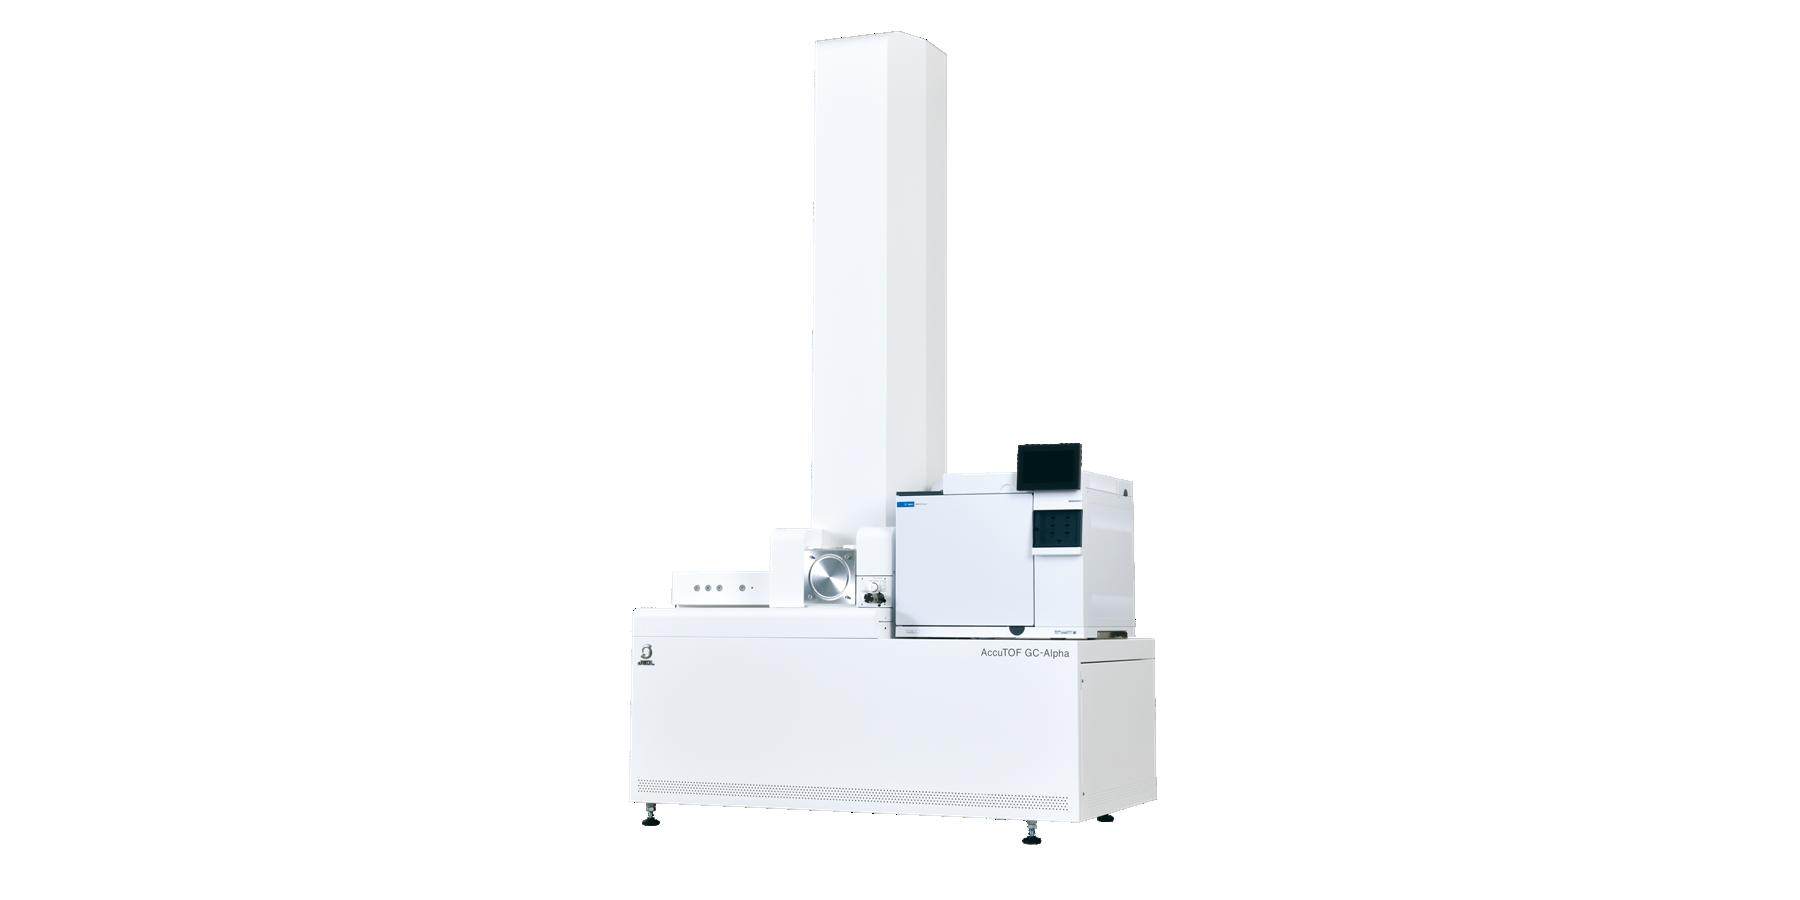 JEOL Introduces New Time-of-Flight Mass Spectrometer JMS-T2000GC AccuTOF™ GC-Alpha